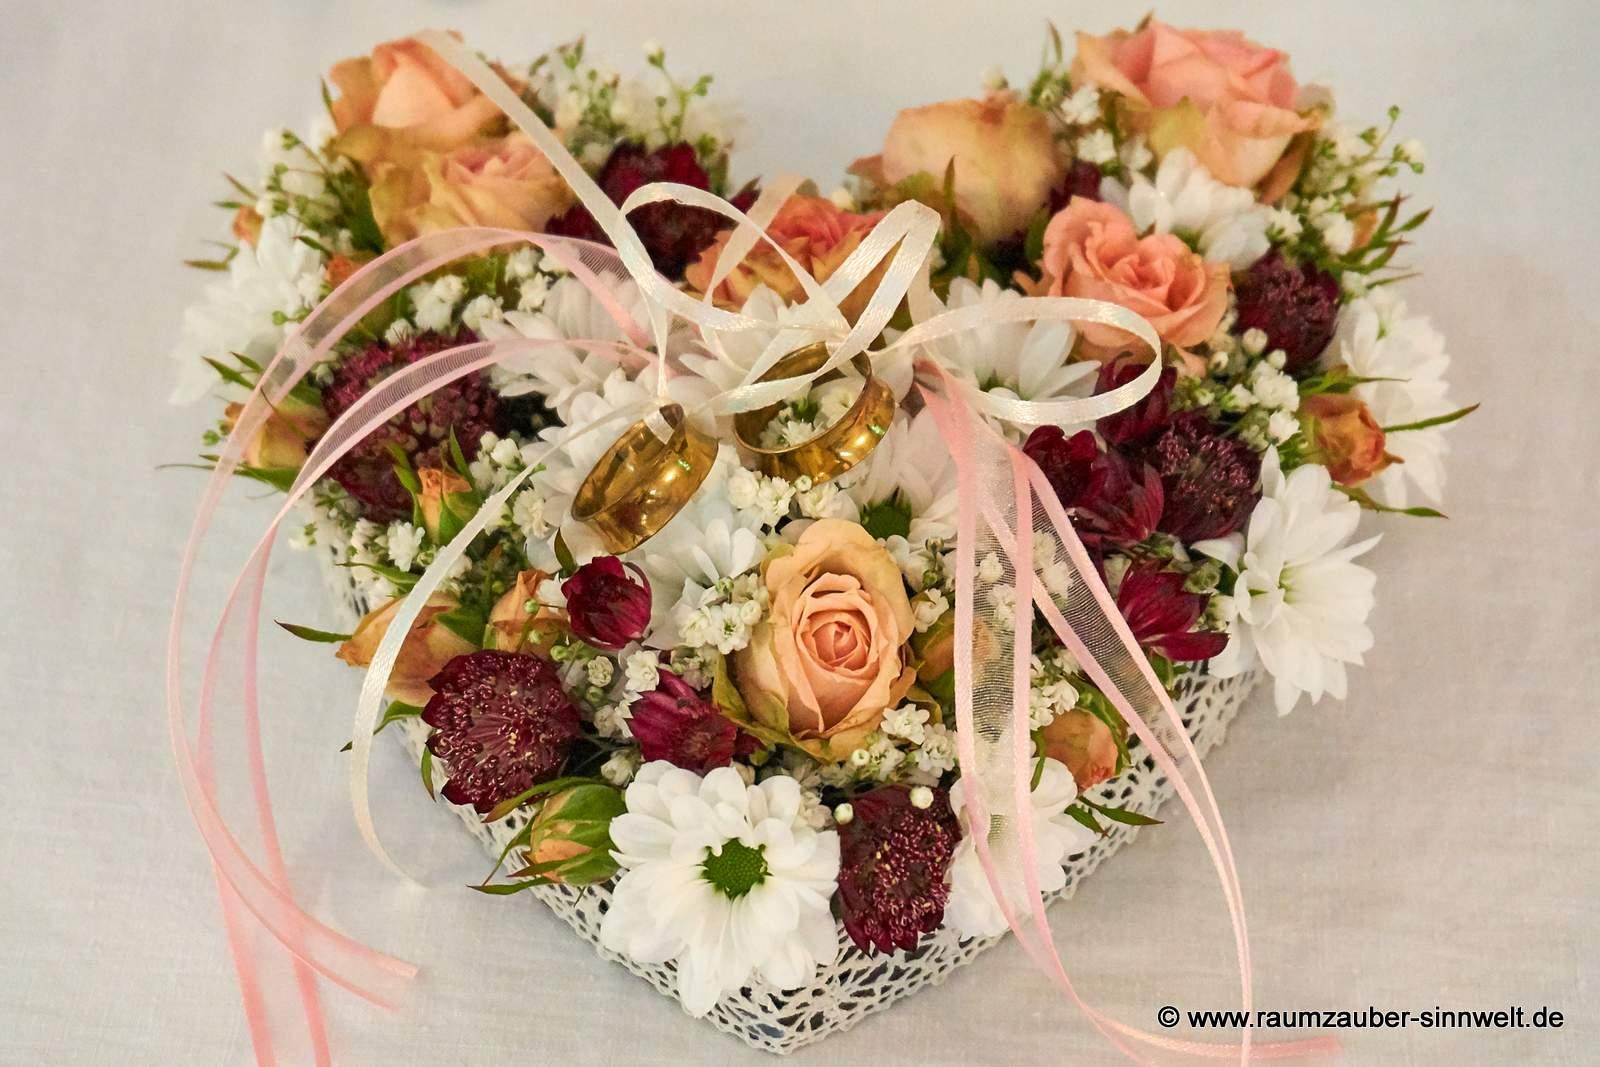 Ringkissen aus Rosen, Santini und Astrantien